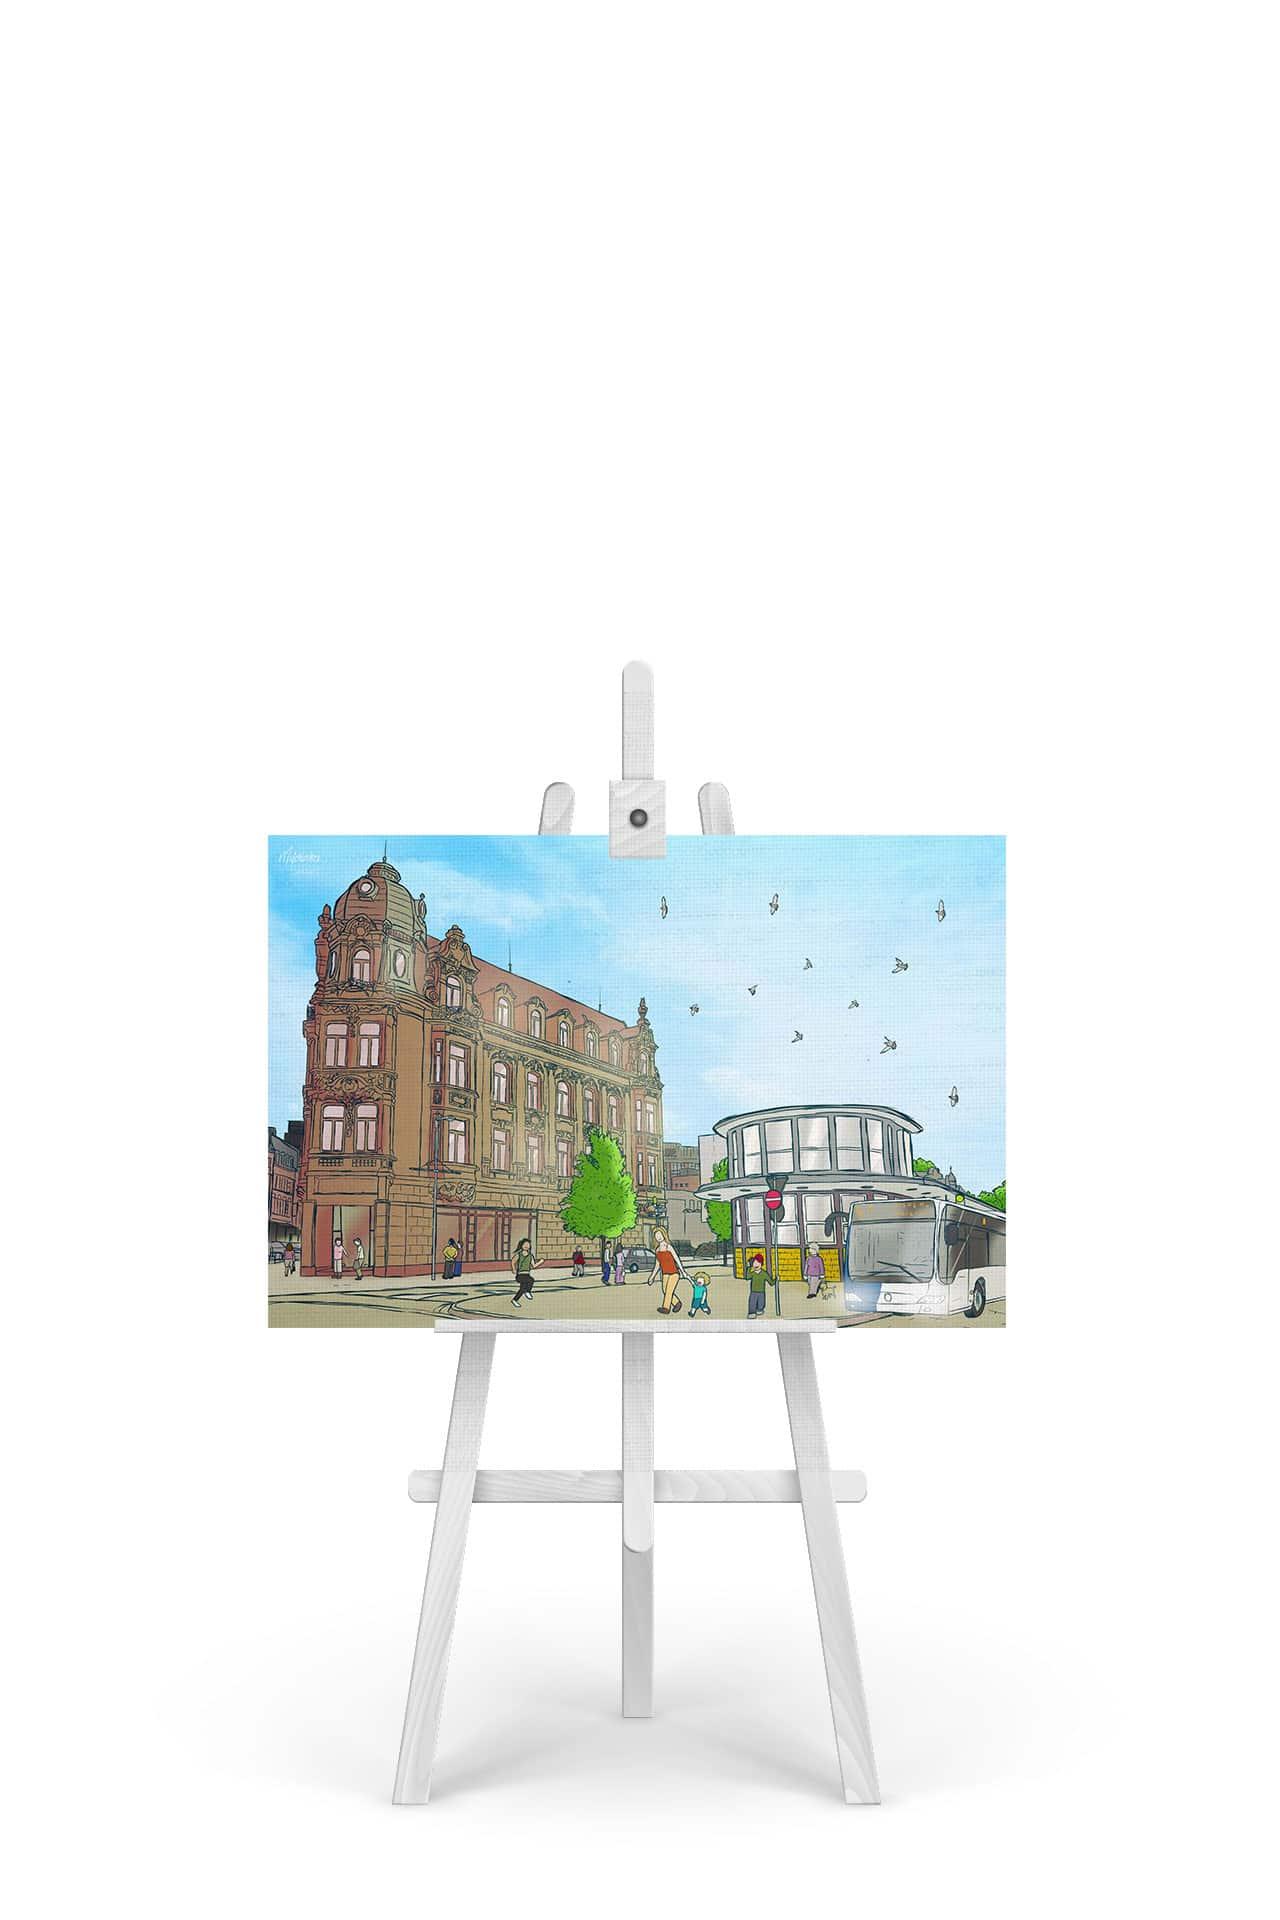 Gemälde Saarlouis Busbahnhof ZOB